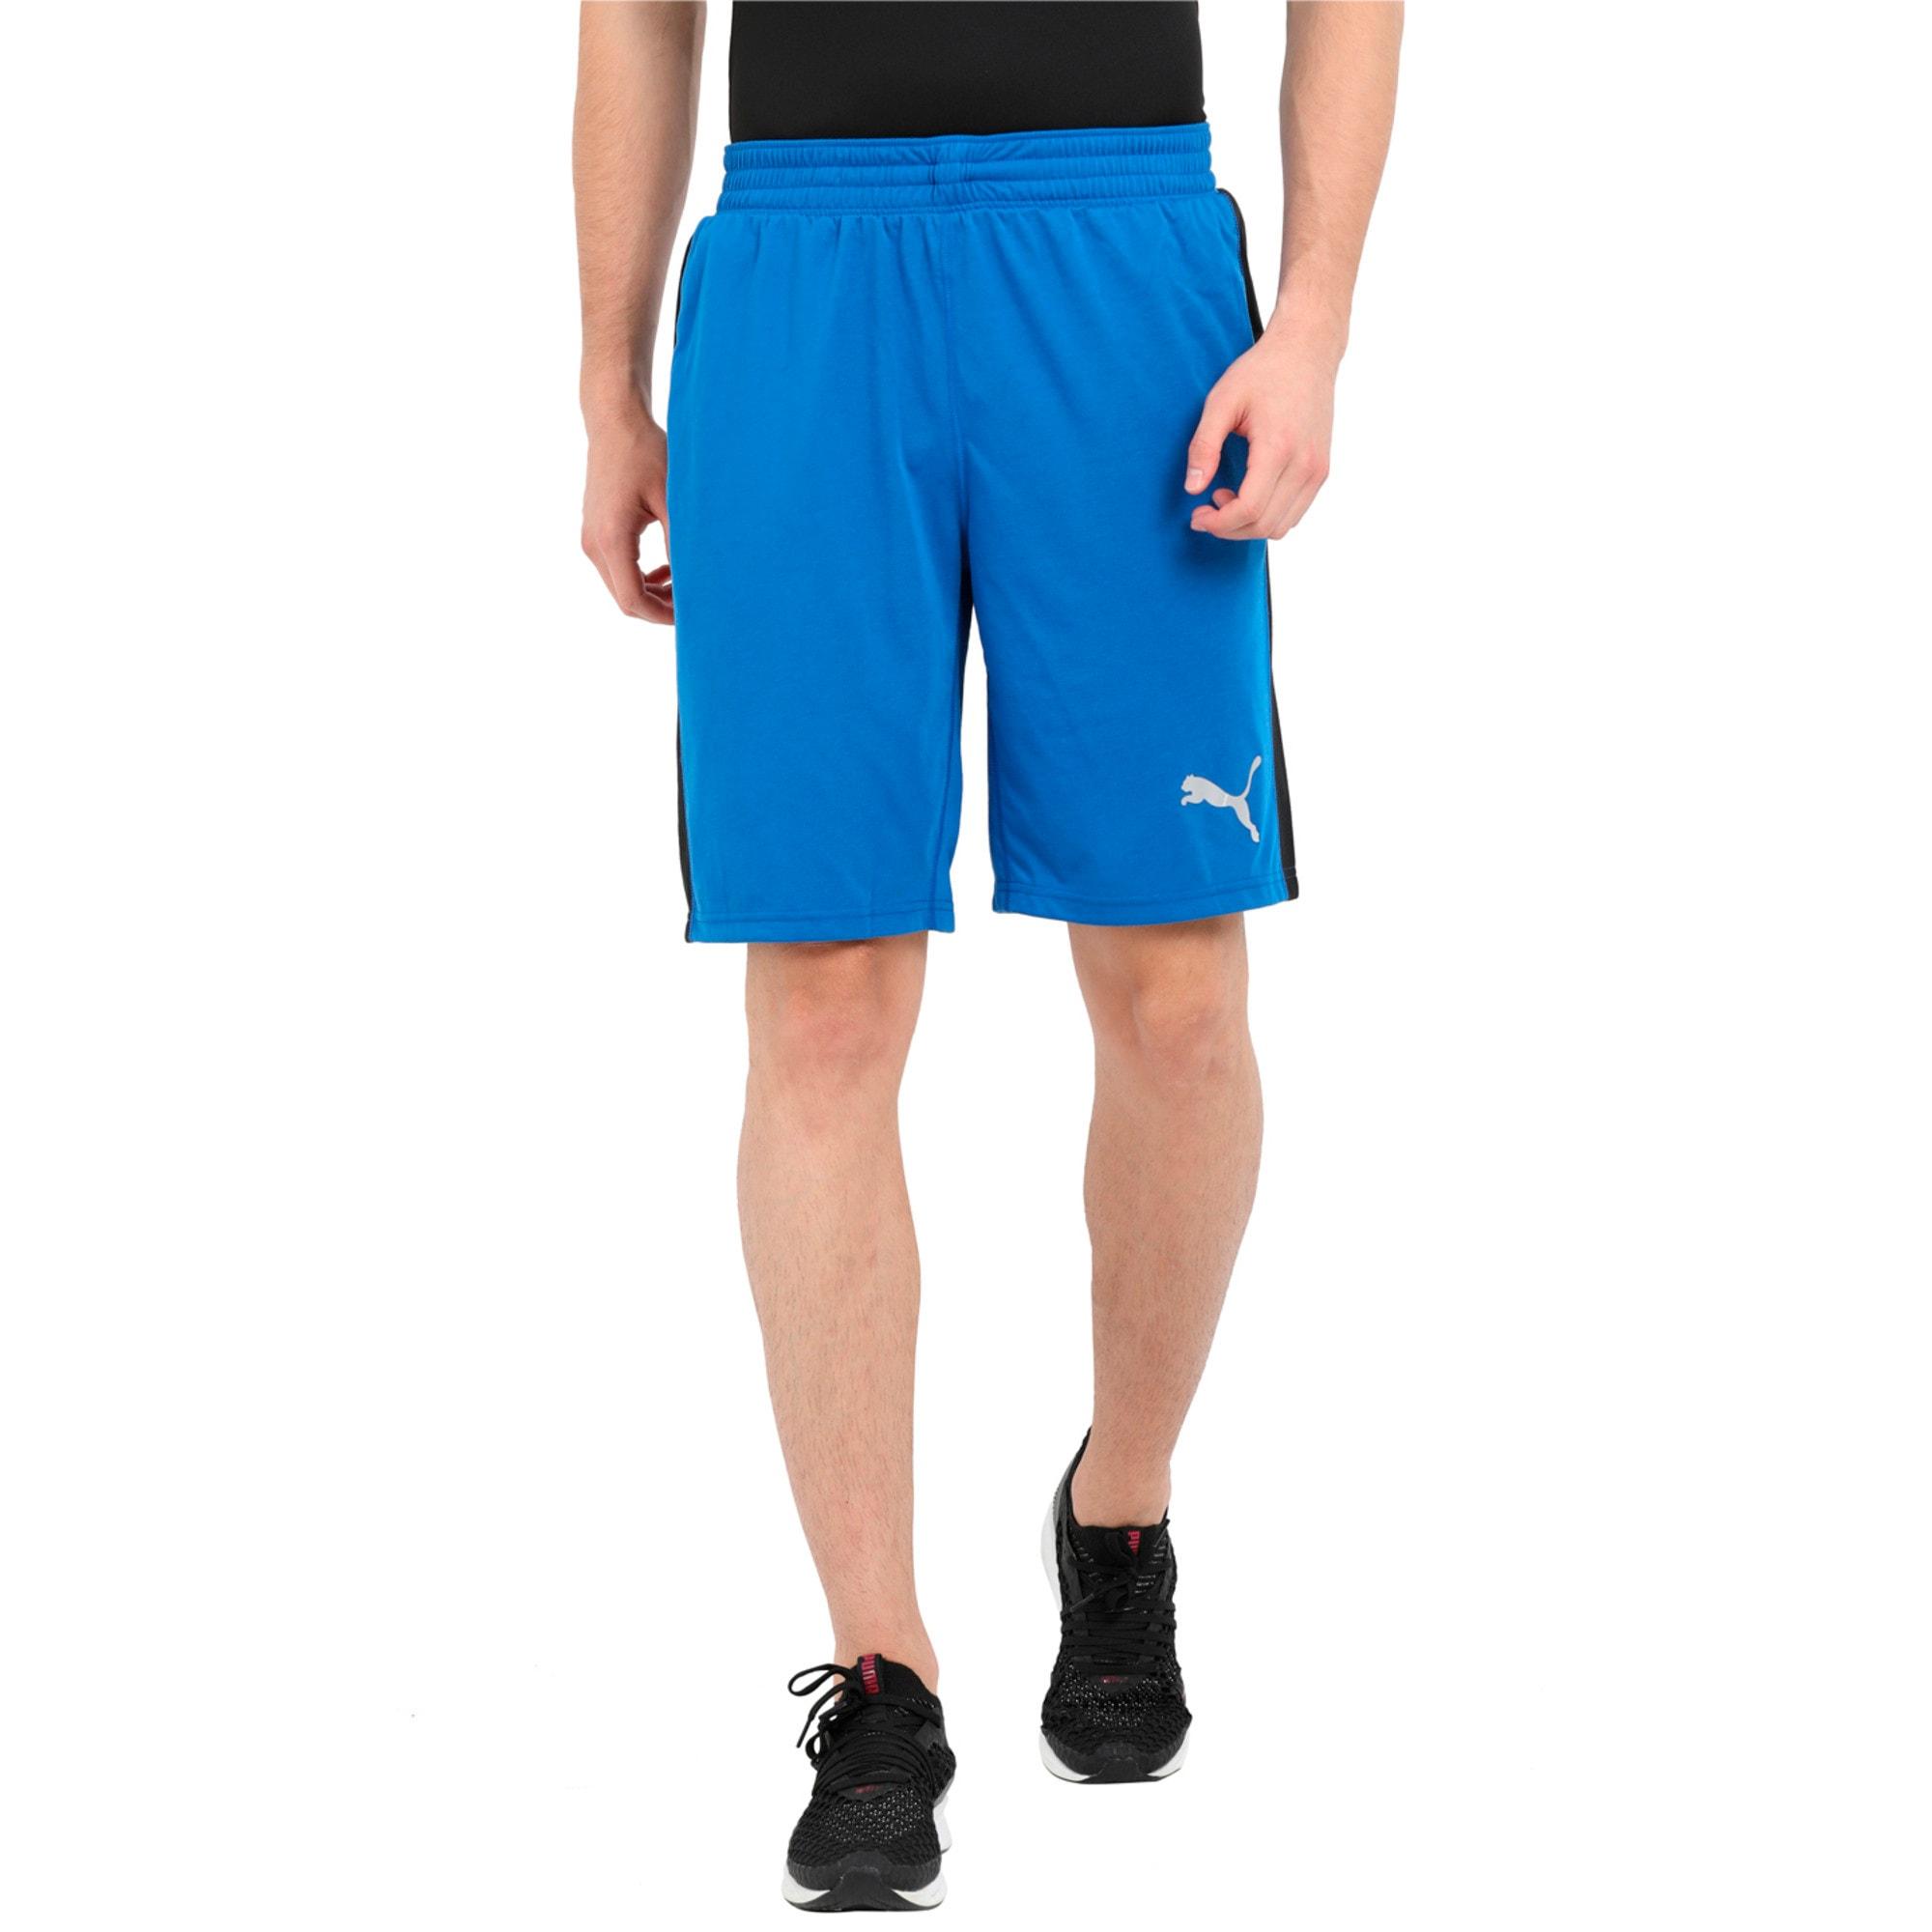 Thumbnail 1 of Essential drirelease Men's Training Shorts, Turkish Sea-Puma Black, medium-IND